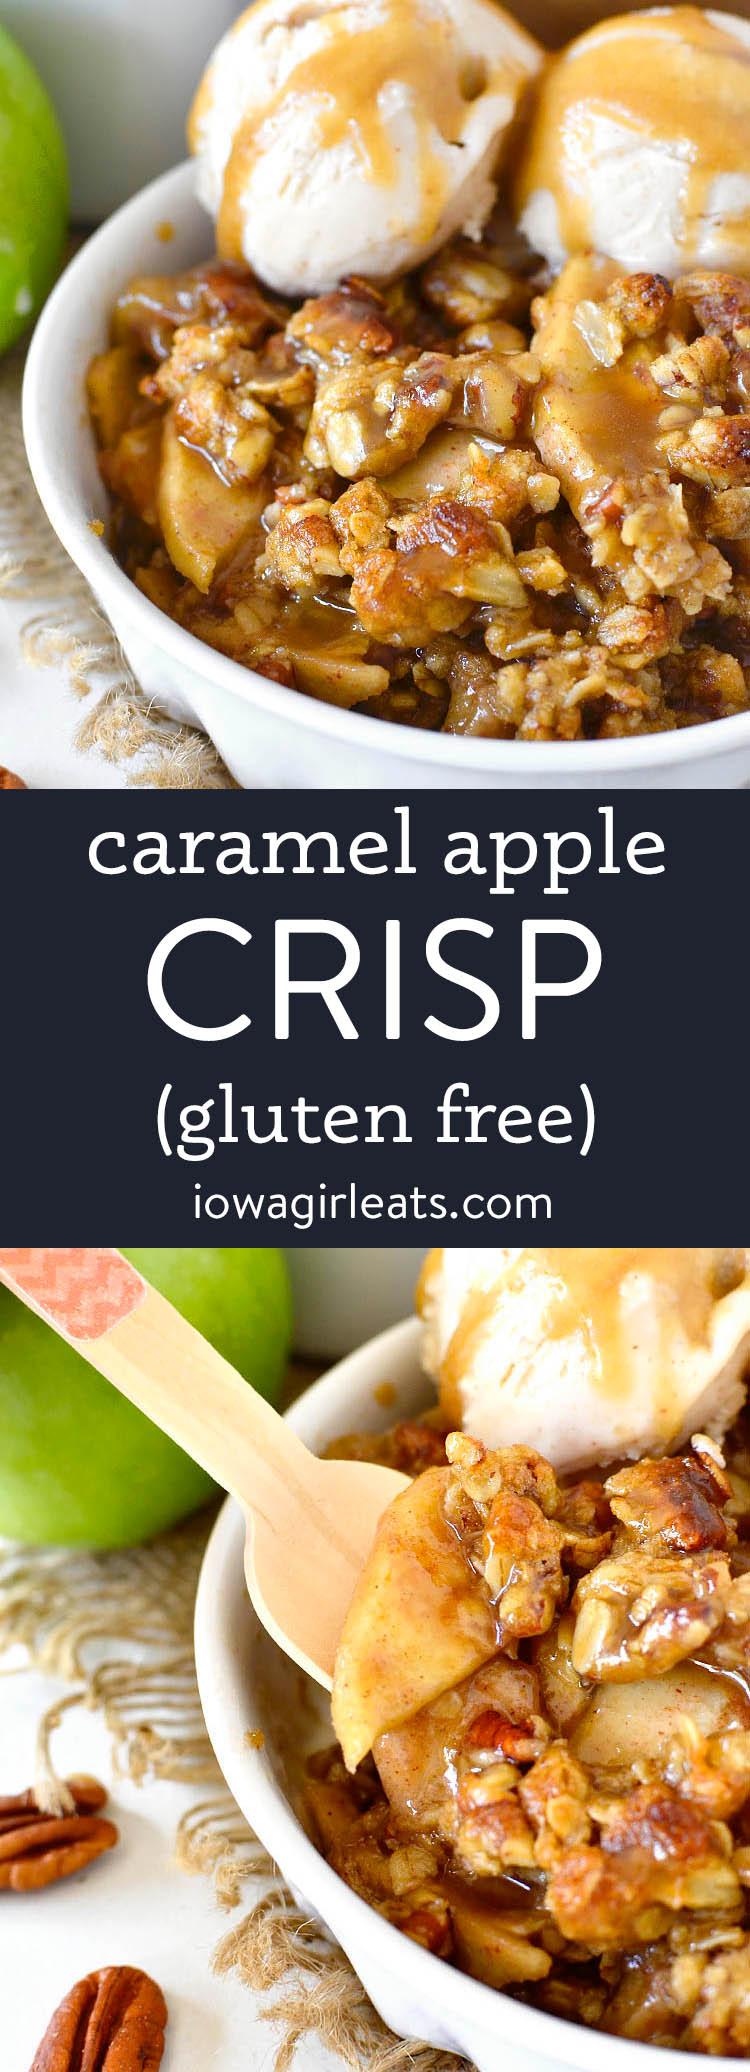 photo collage of gluten free caramel apple crisp